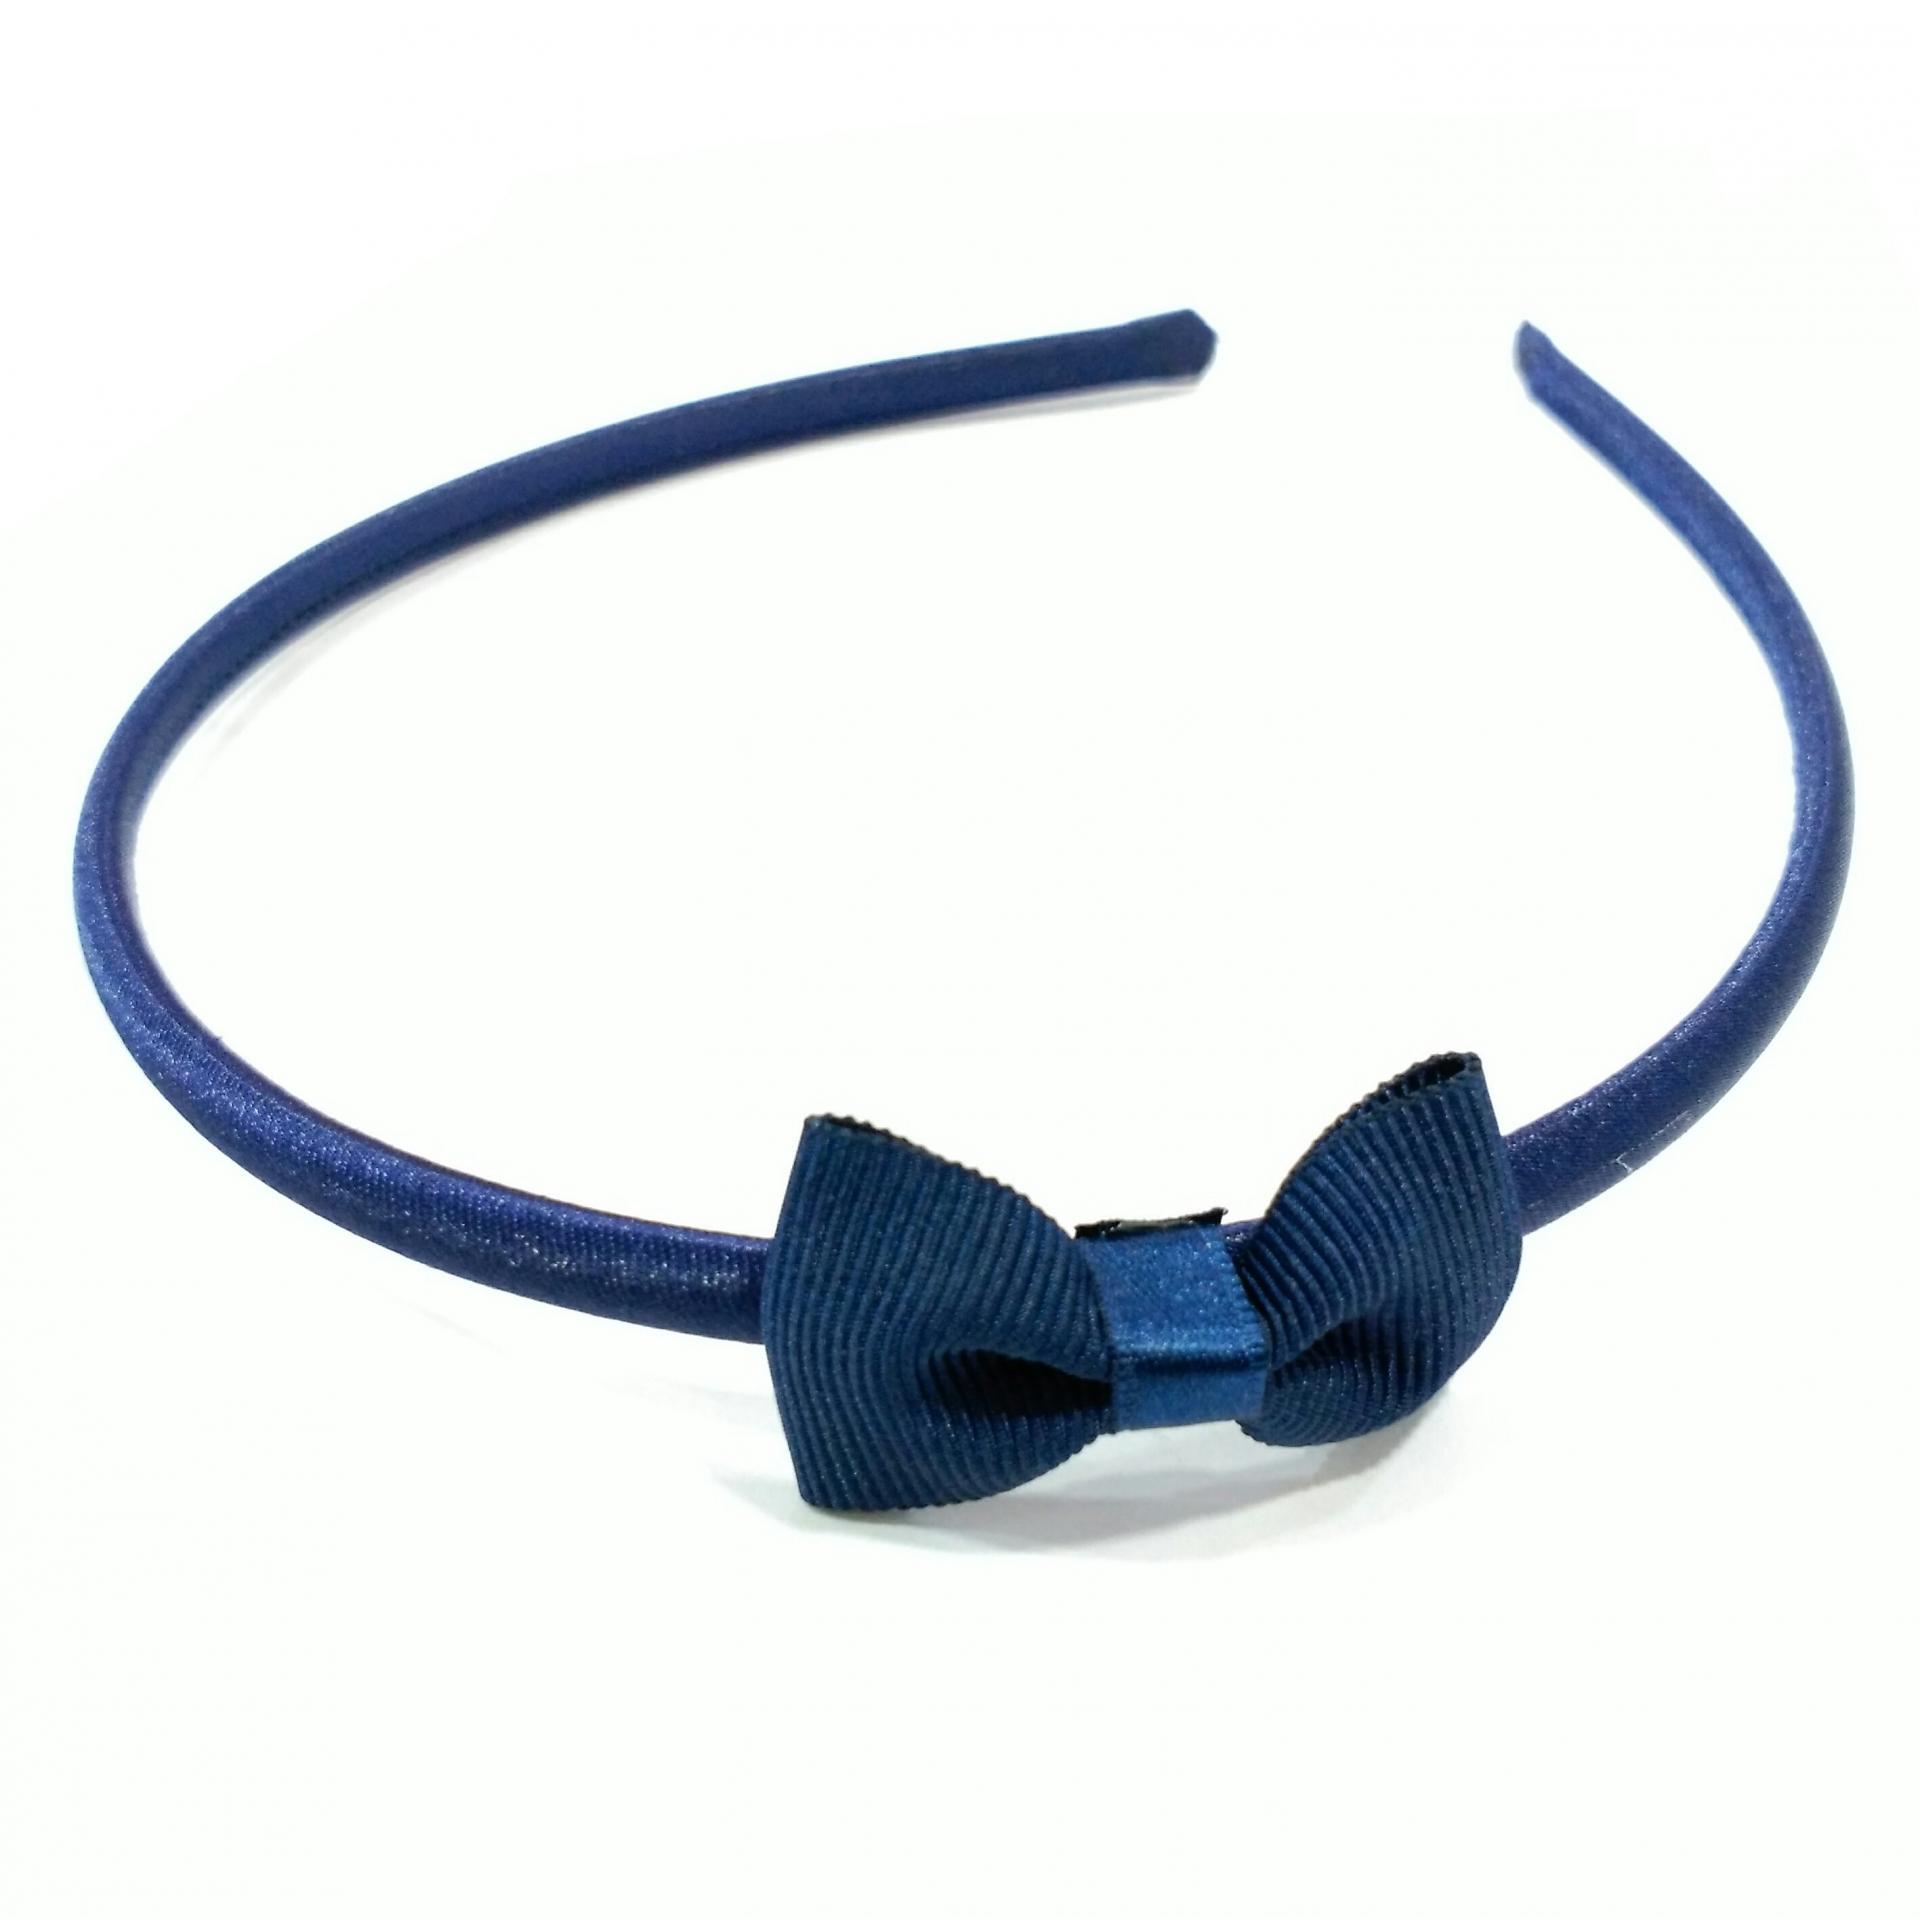 Diadema forrada con lazo azul marino